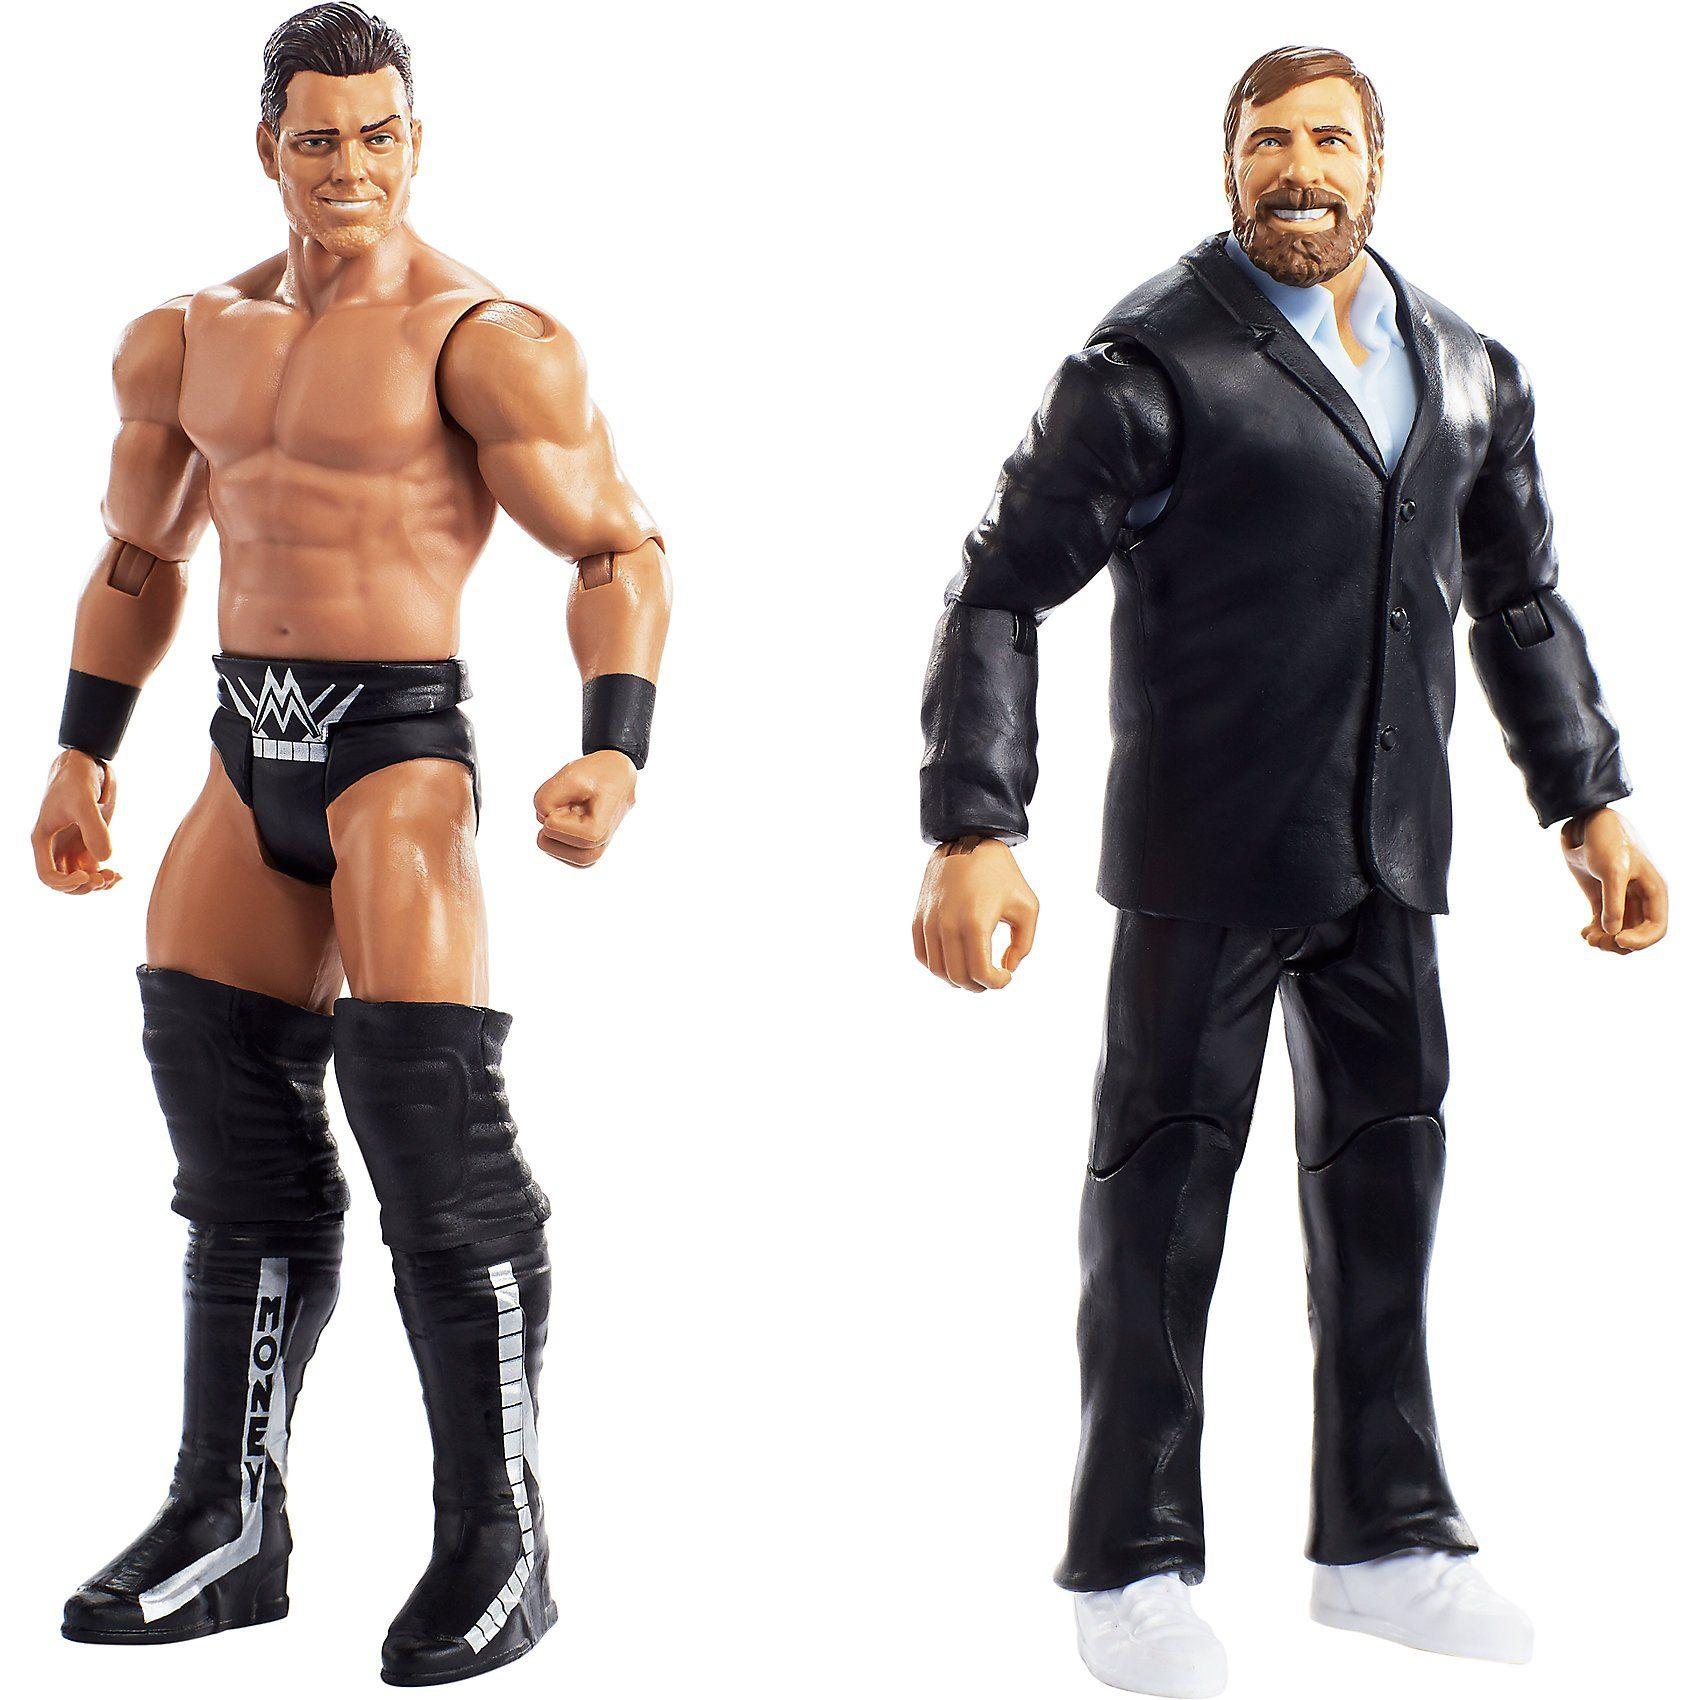 Mattel® WWE Basis Figuren (15 cm) 2er-Pack The Miz & Daniel Bryan